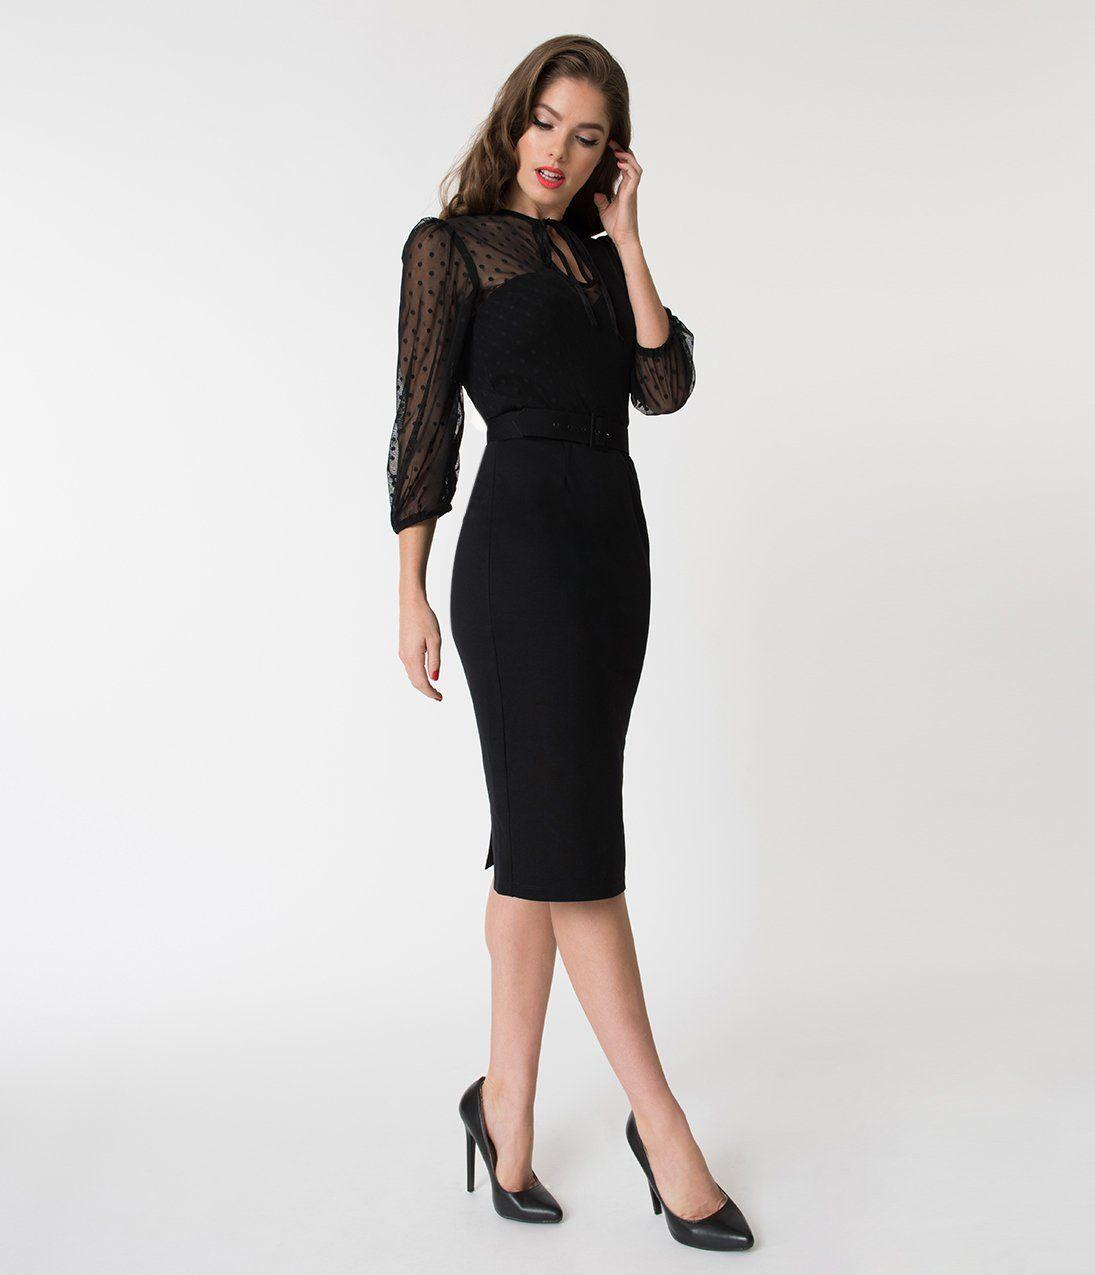 51b24be6780 Vixen by Micheline Pitt Black Polka Dot Frenchie Wiggle Dress – Unique  Vintage